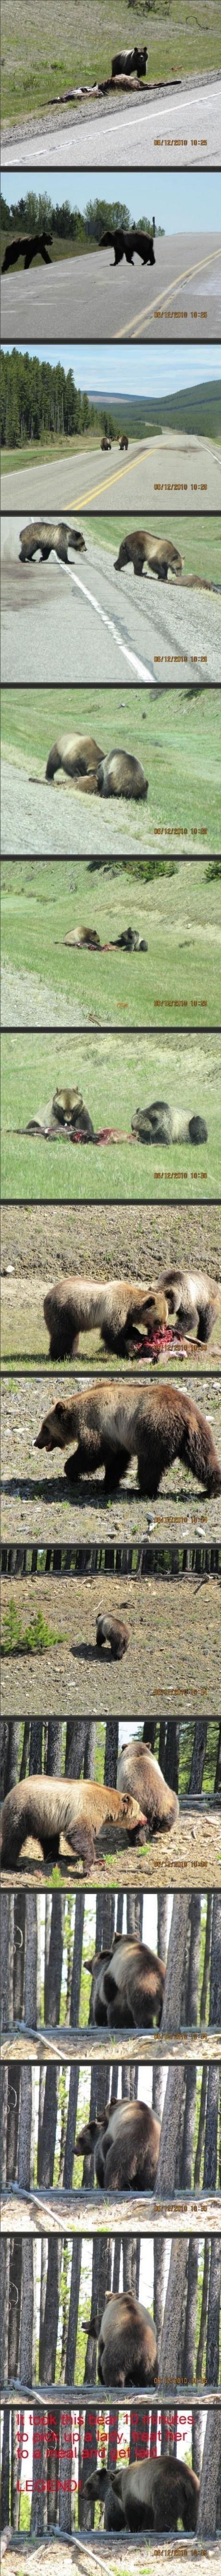 legendary bear. . was alumni than